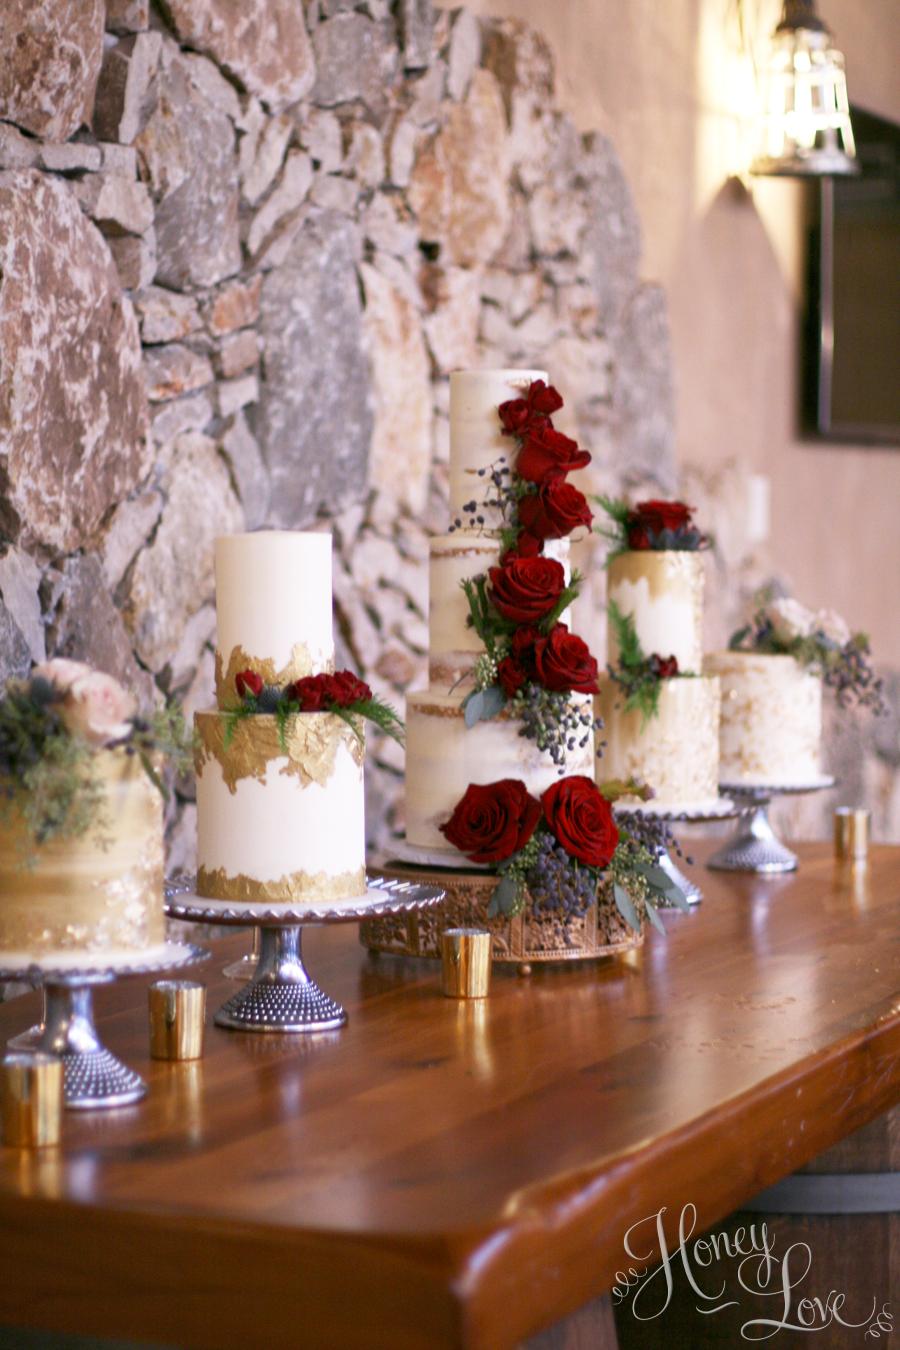 Multi-cake display to serve 150 wedding guests.